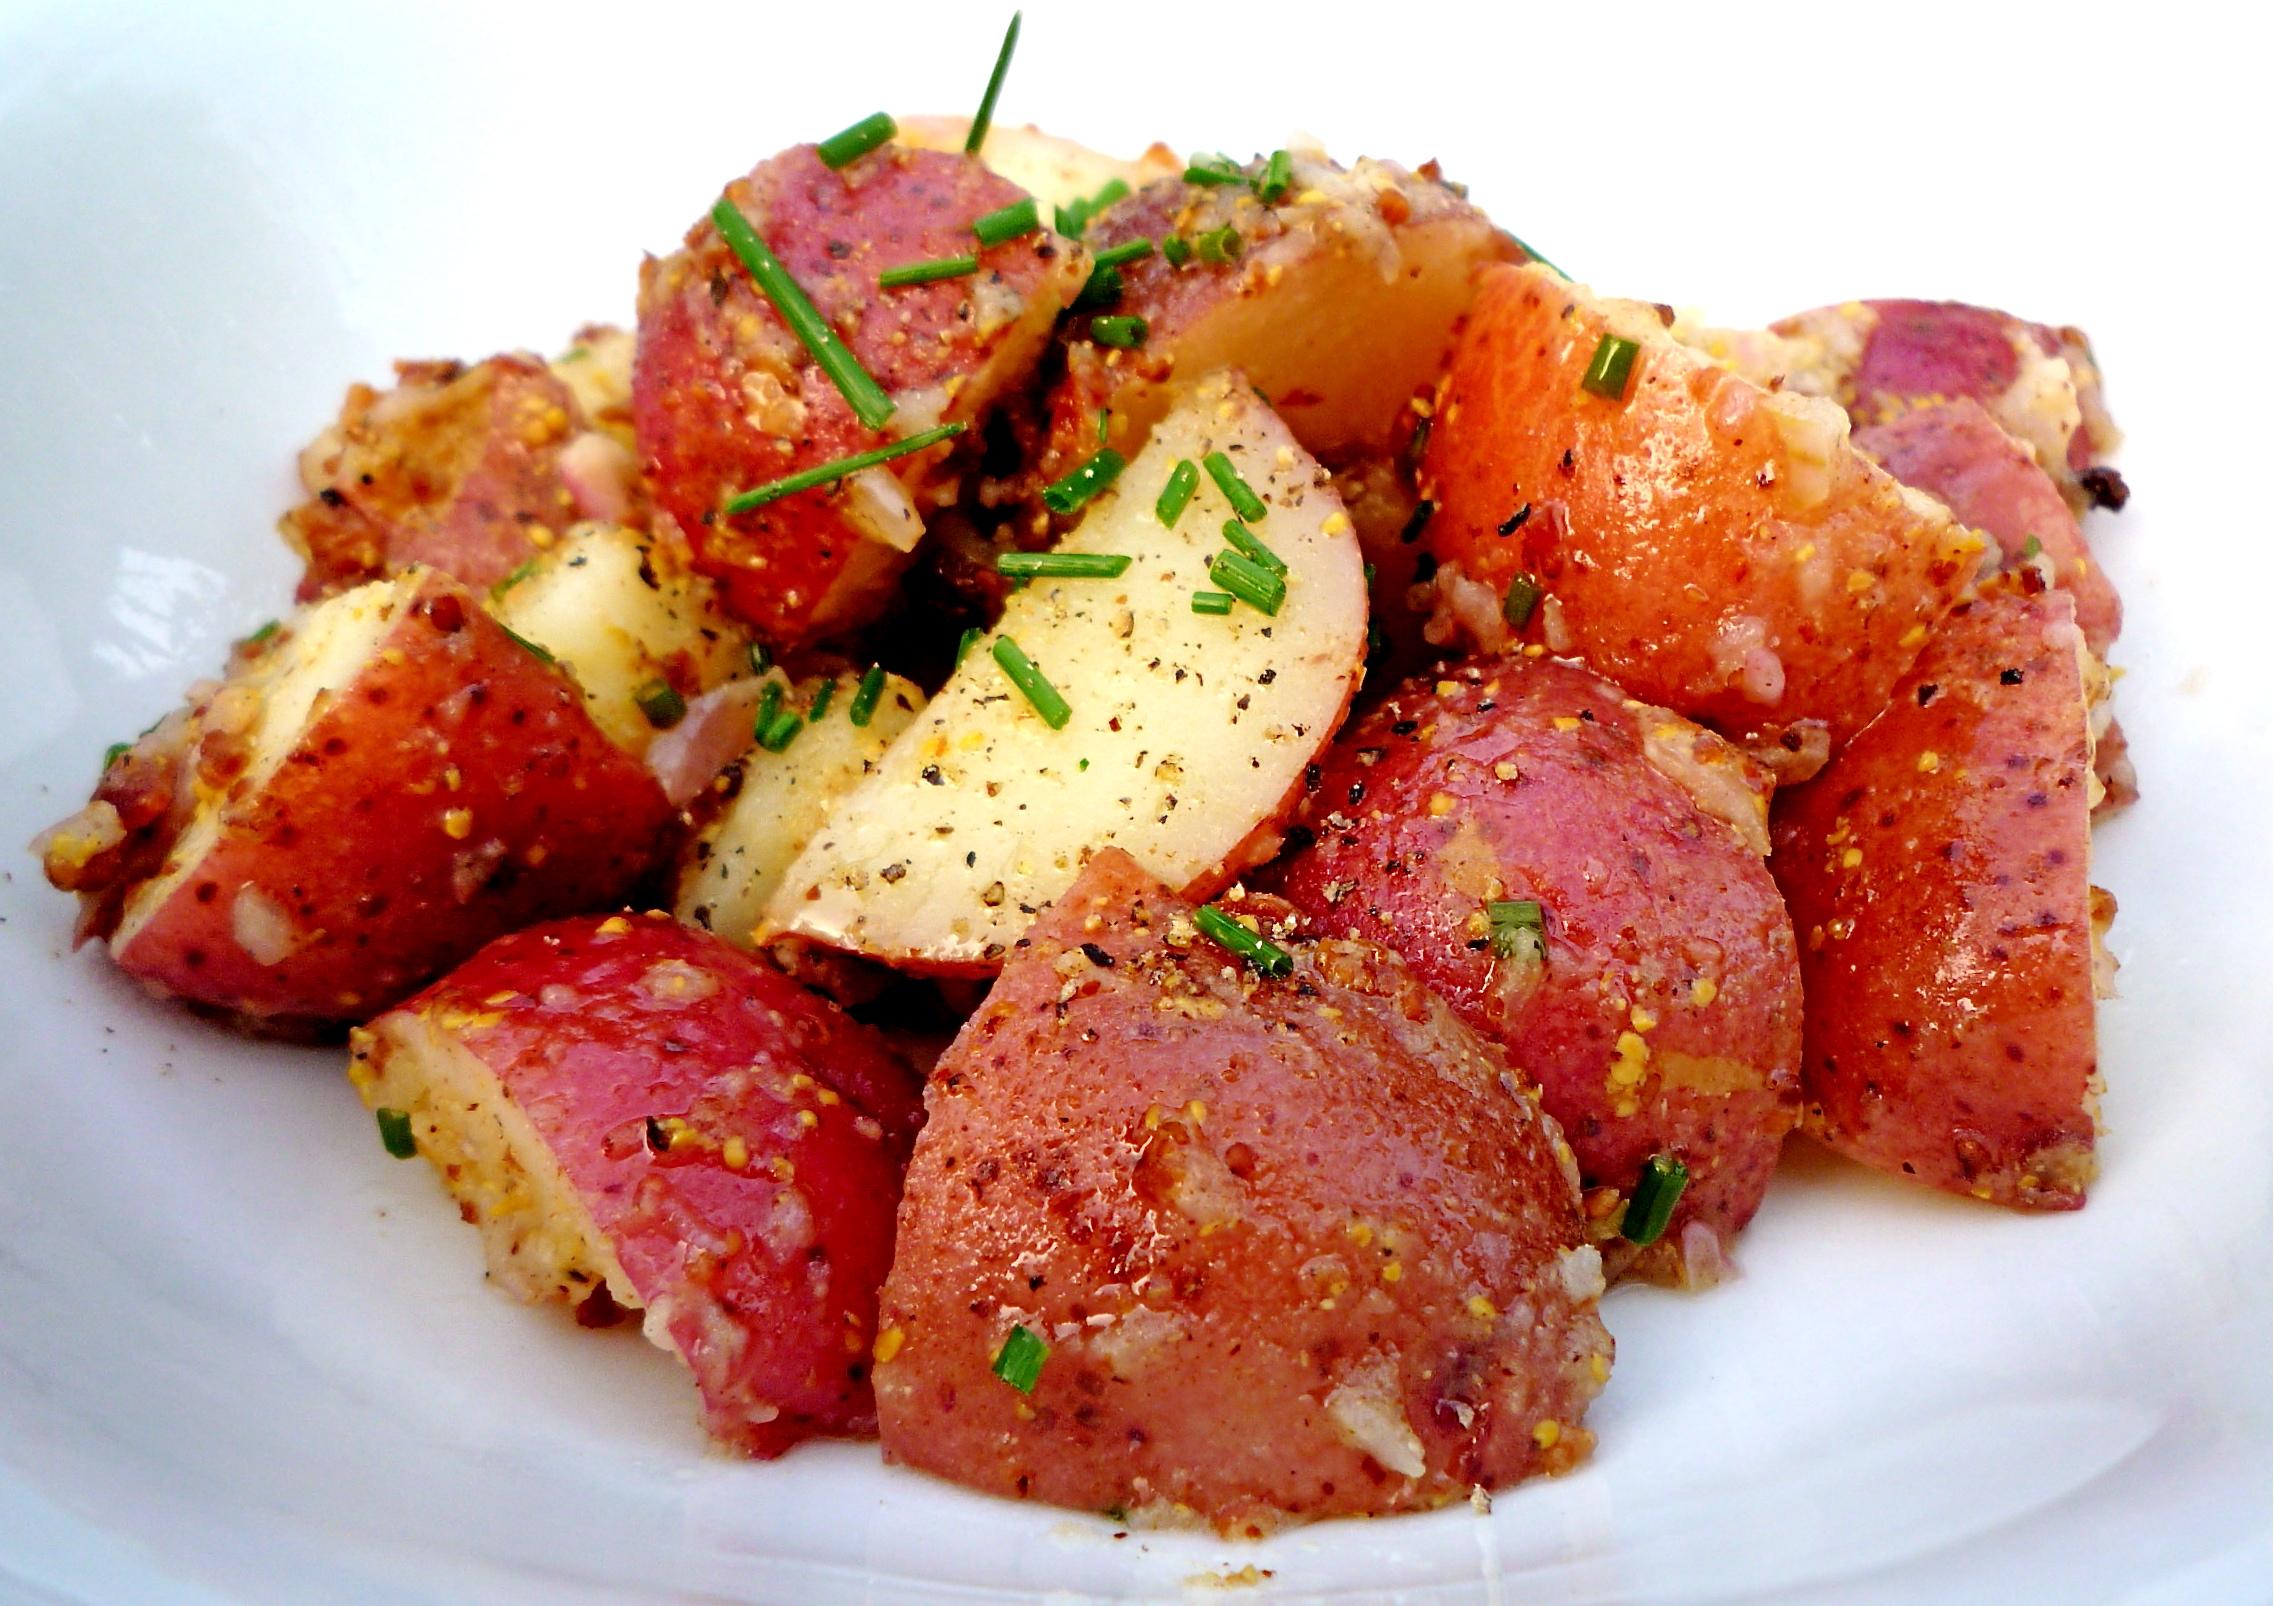 Baby Red Potato Salad with Mustard Vinaigrette | The Seasonal Gourmet